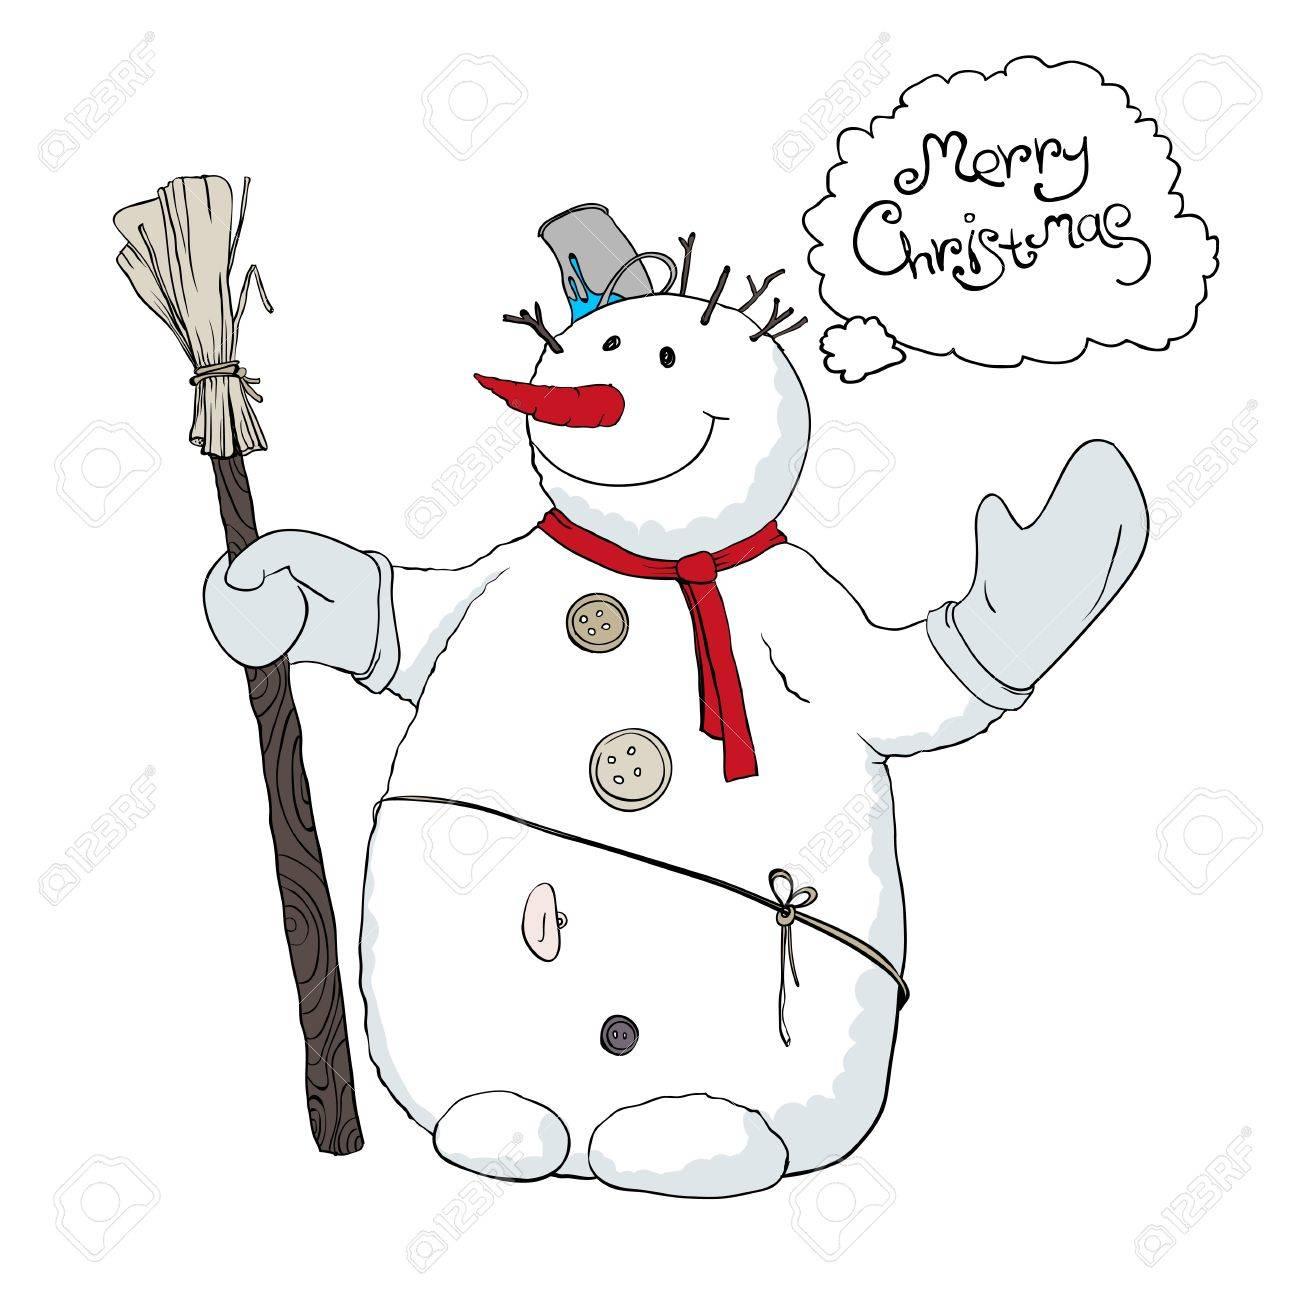 Cute snowman illustration. Stock Vector - 11547760